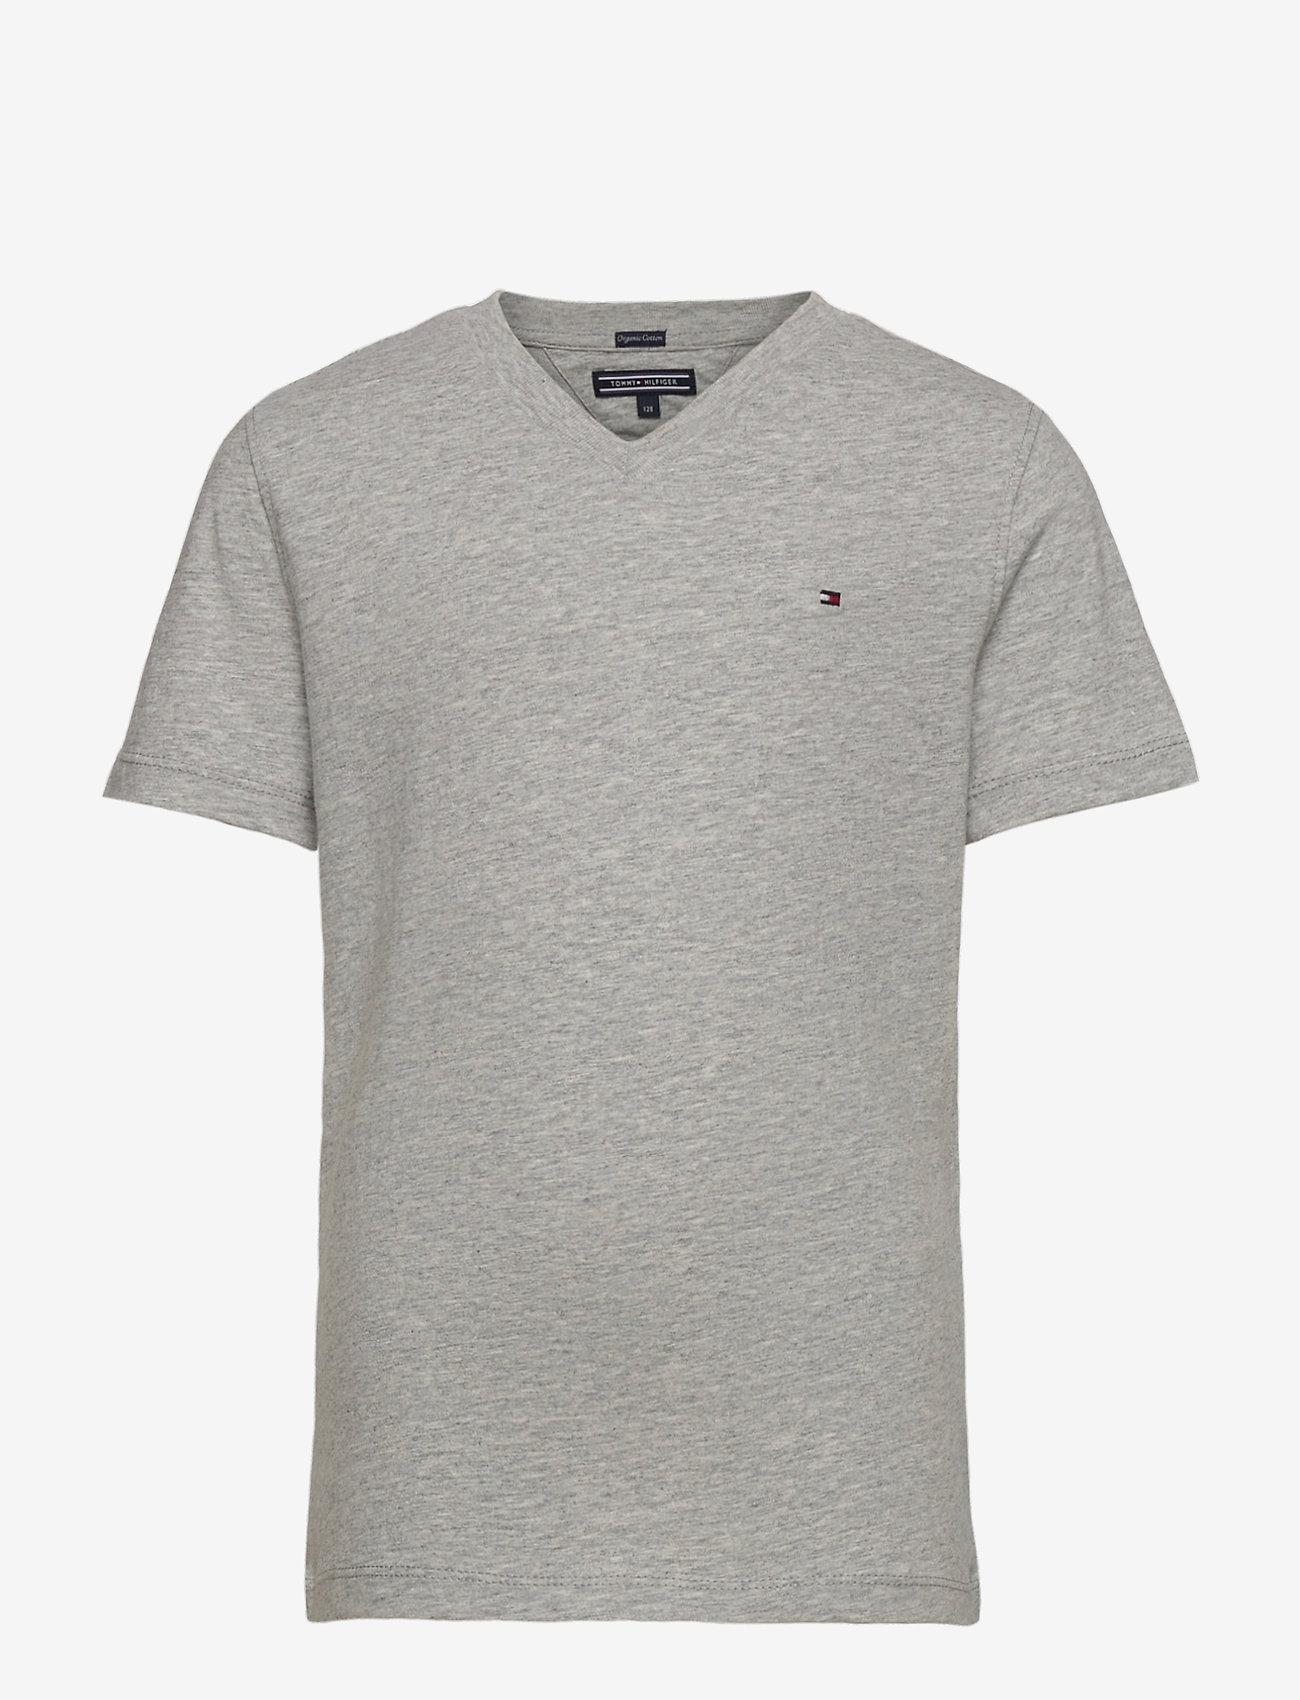 Tommy Hilfiger - BOYS BASIC VN KNIT S - short-sleeved - grey heather - 0